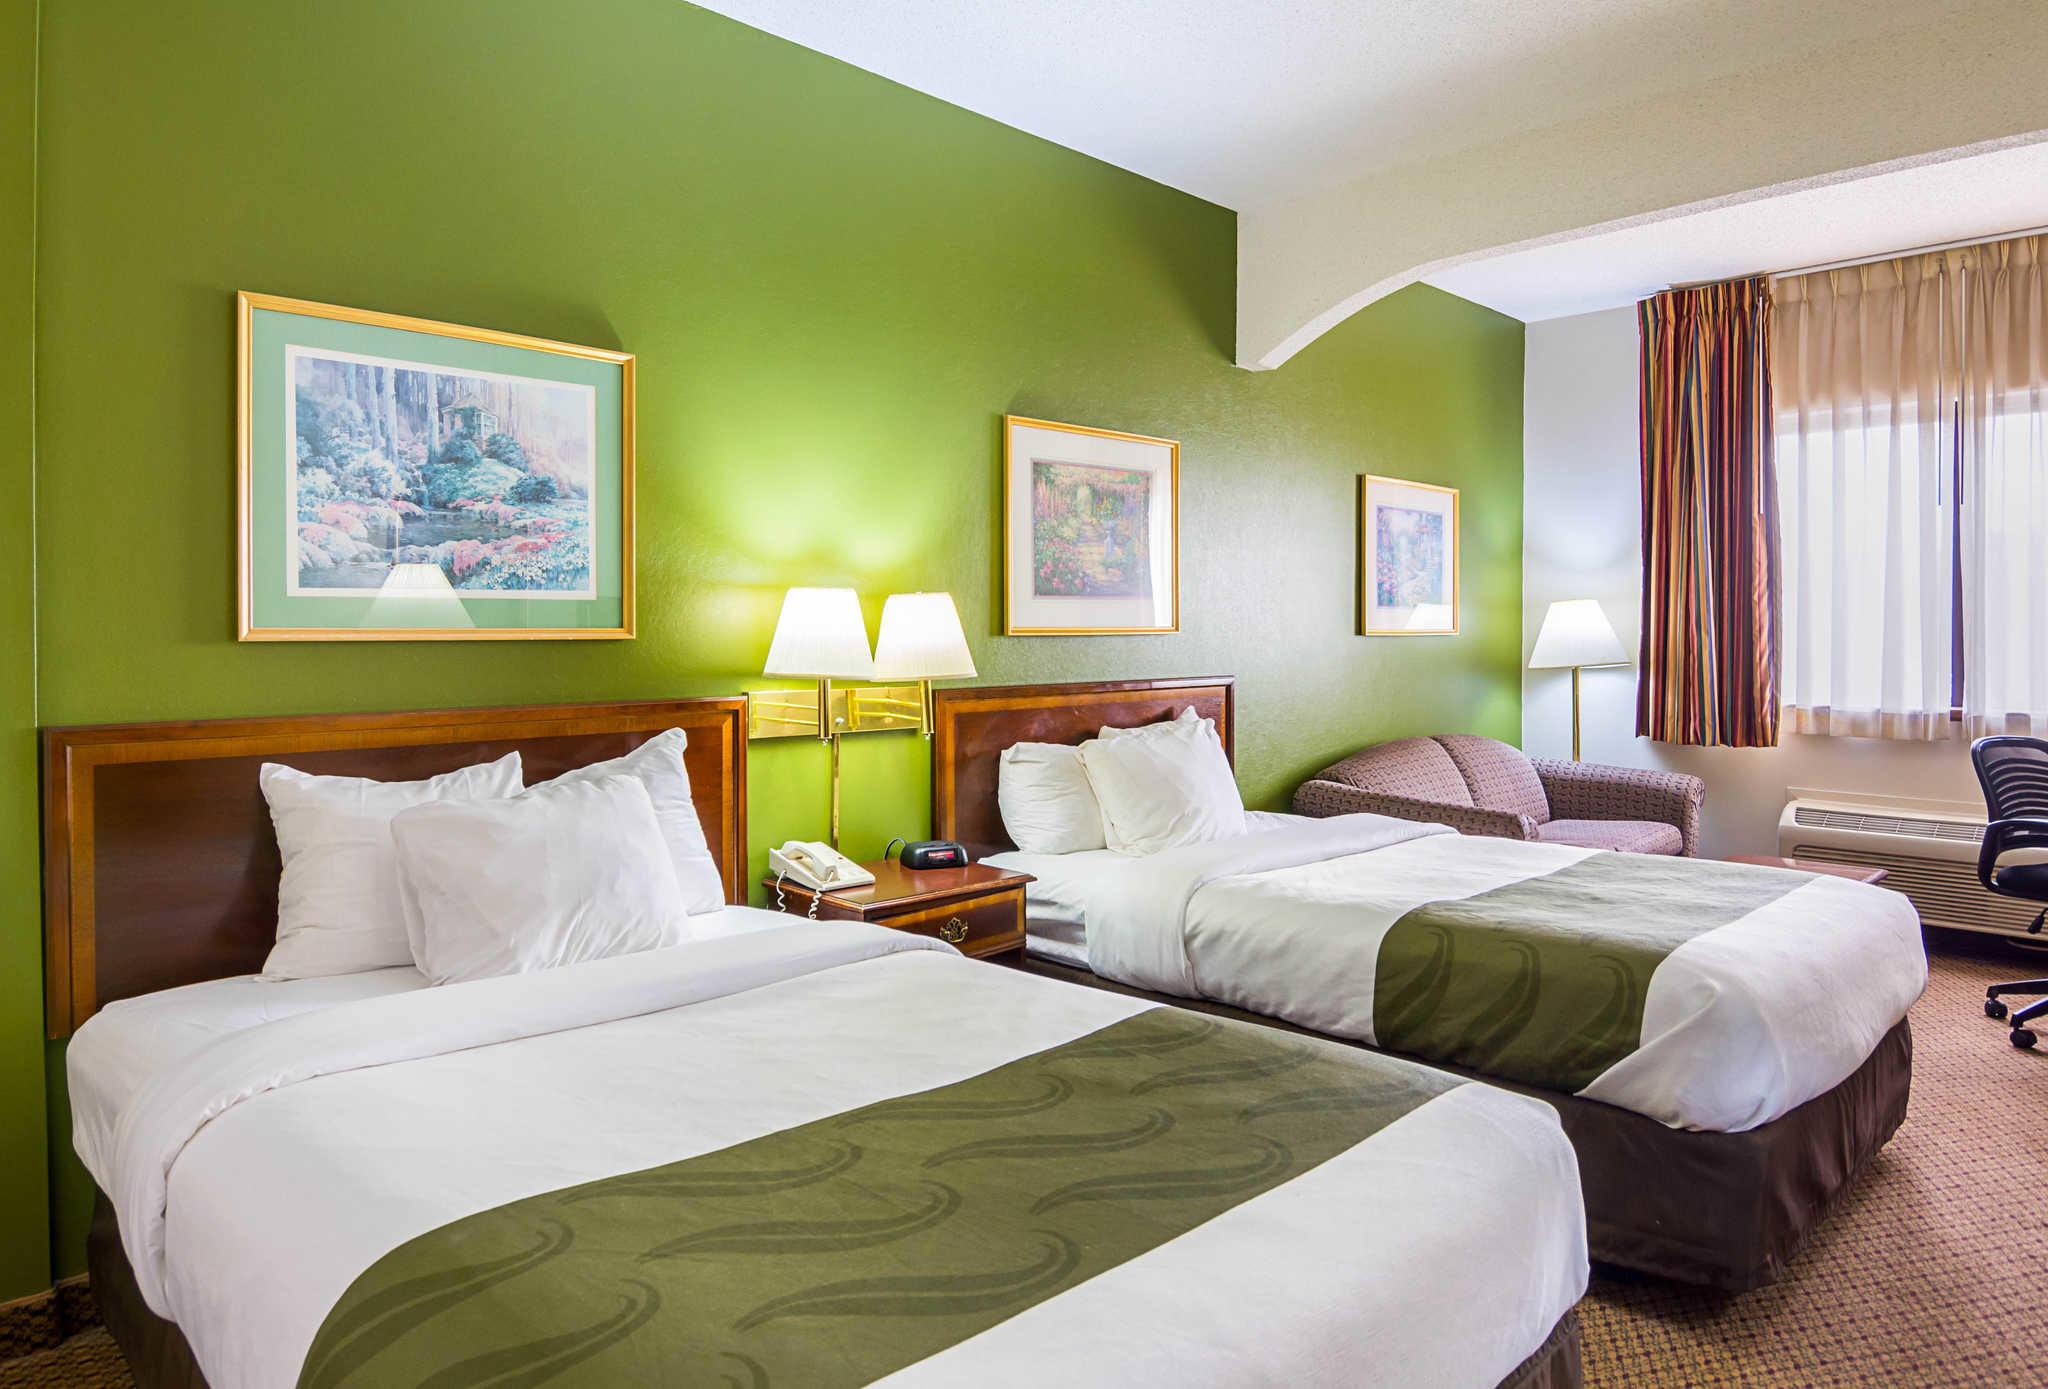 Quality Inn & Suites Kearneysville - Martinsburg image 7